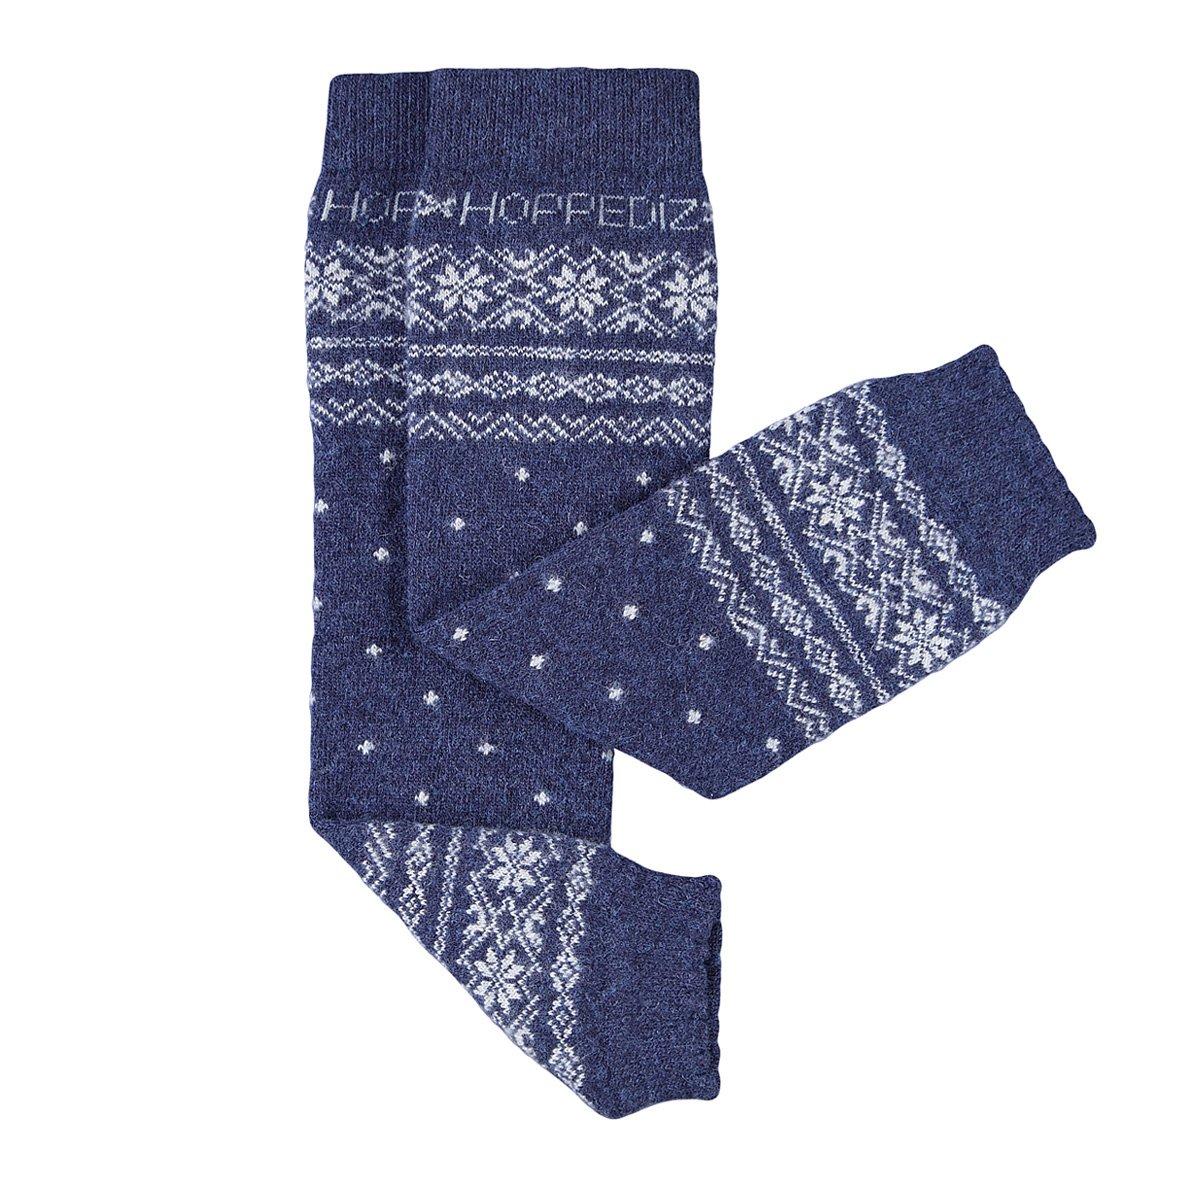 Hoppediz Cashmere/Merino Wool Baby Leg Warmers (Norwegian Blue) HOPPEDIZ GmbH & Co. KG Stn-bla